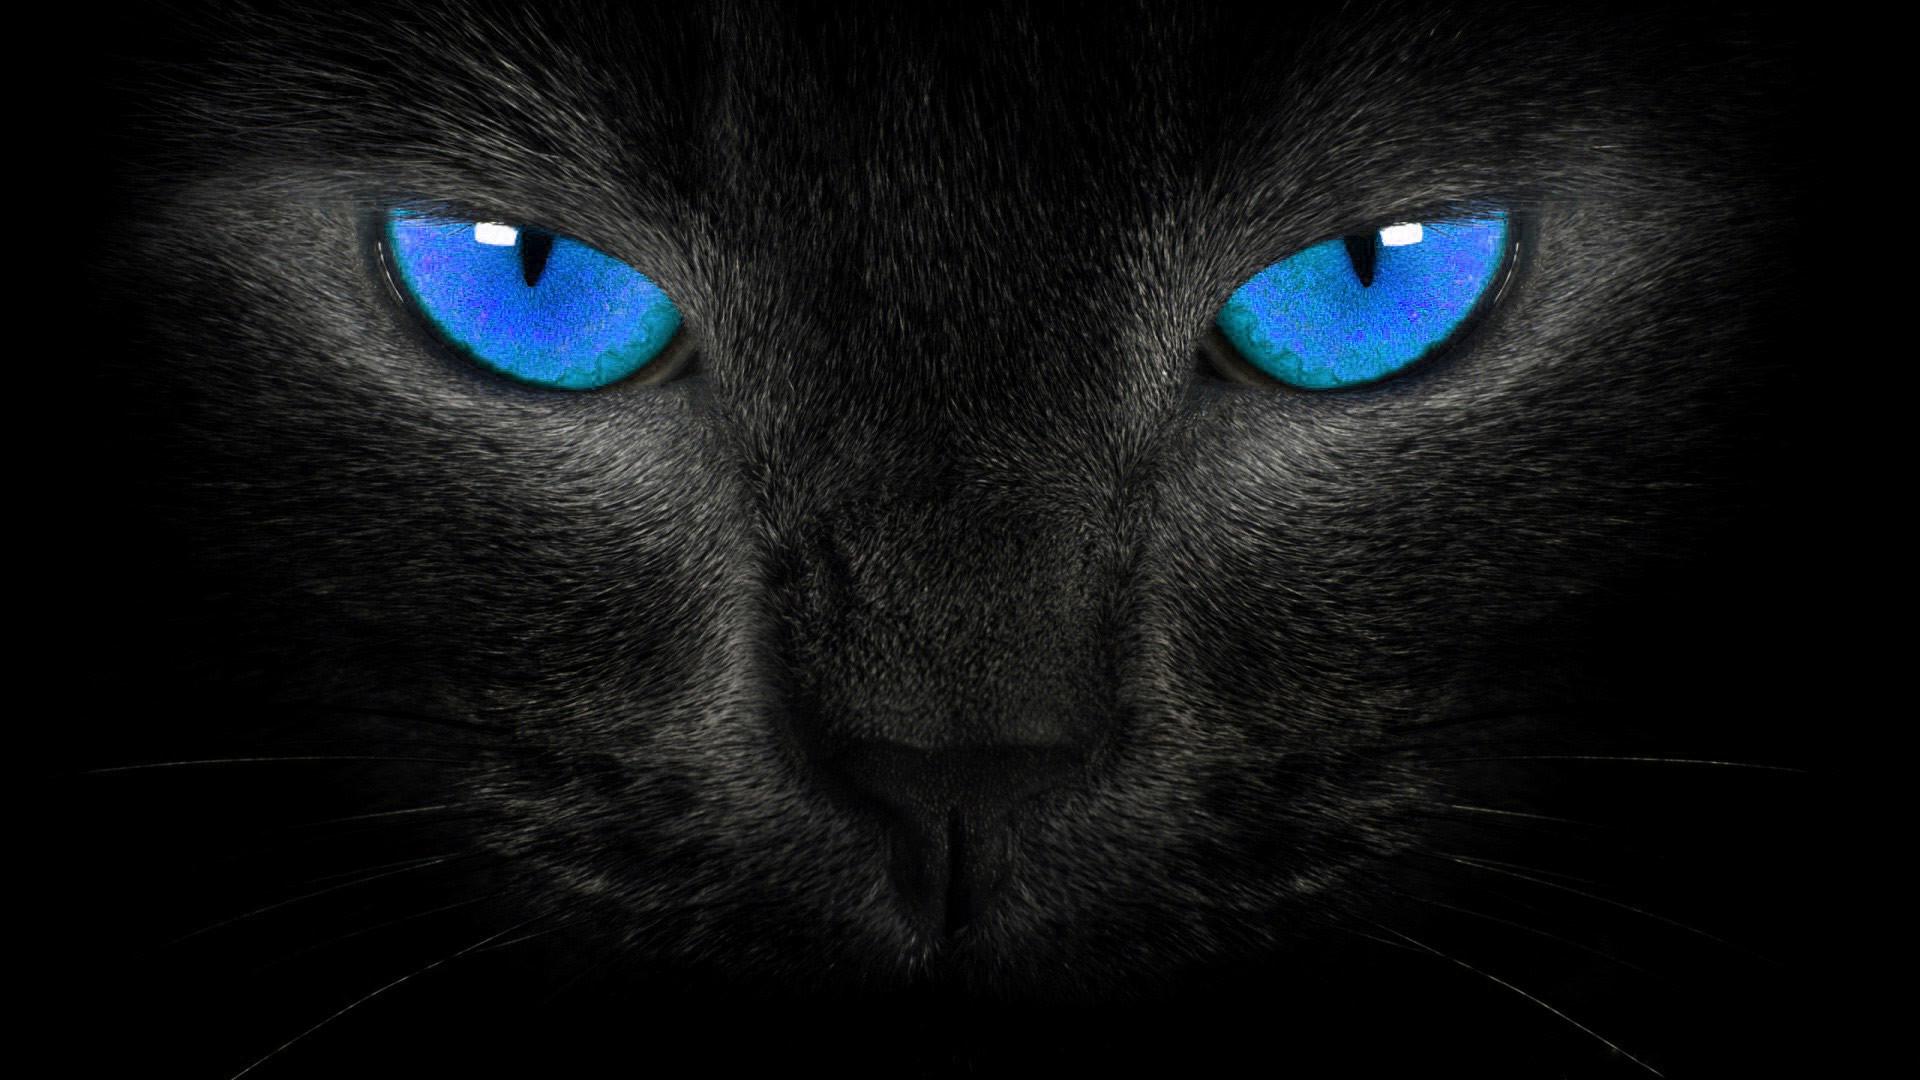 Black Panther Blue Eyes Wallpaper 60 Images